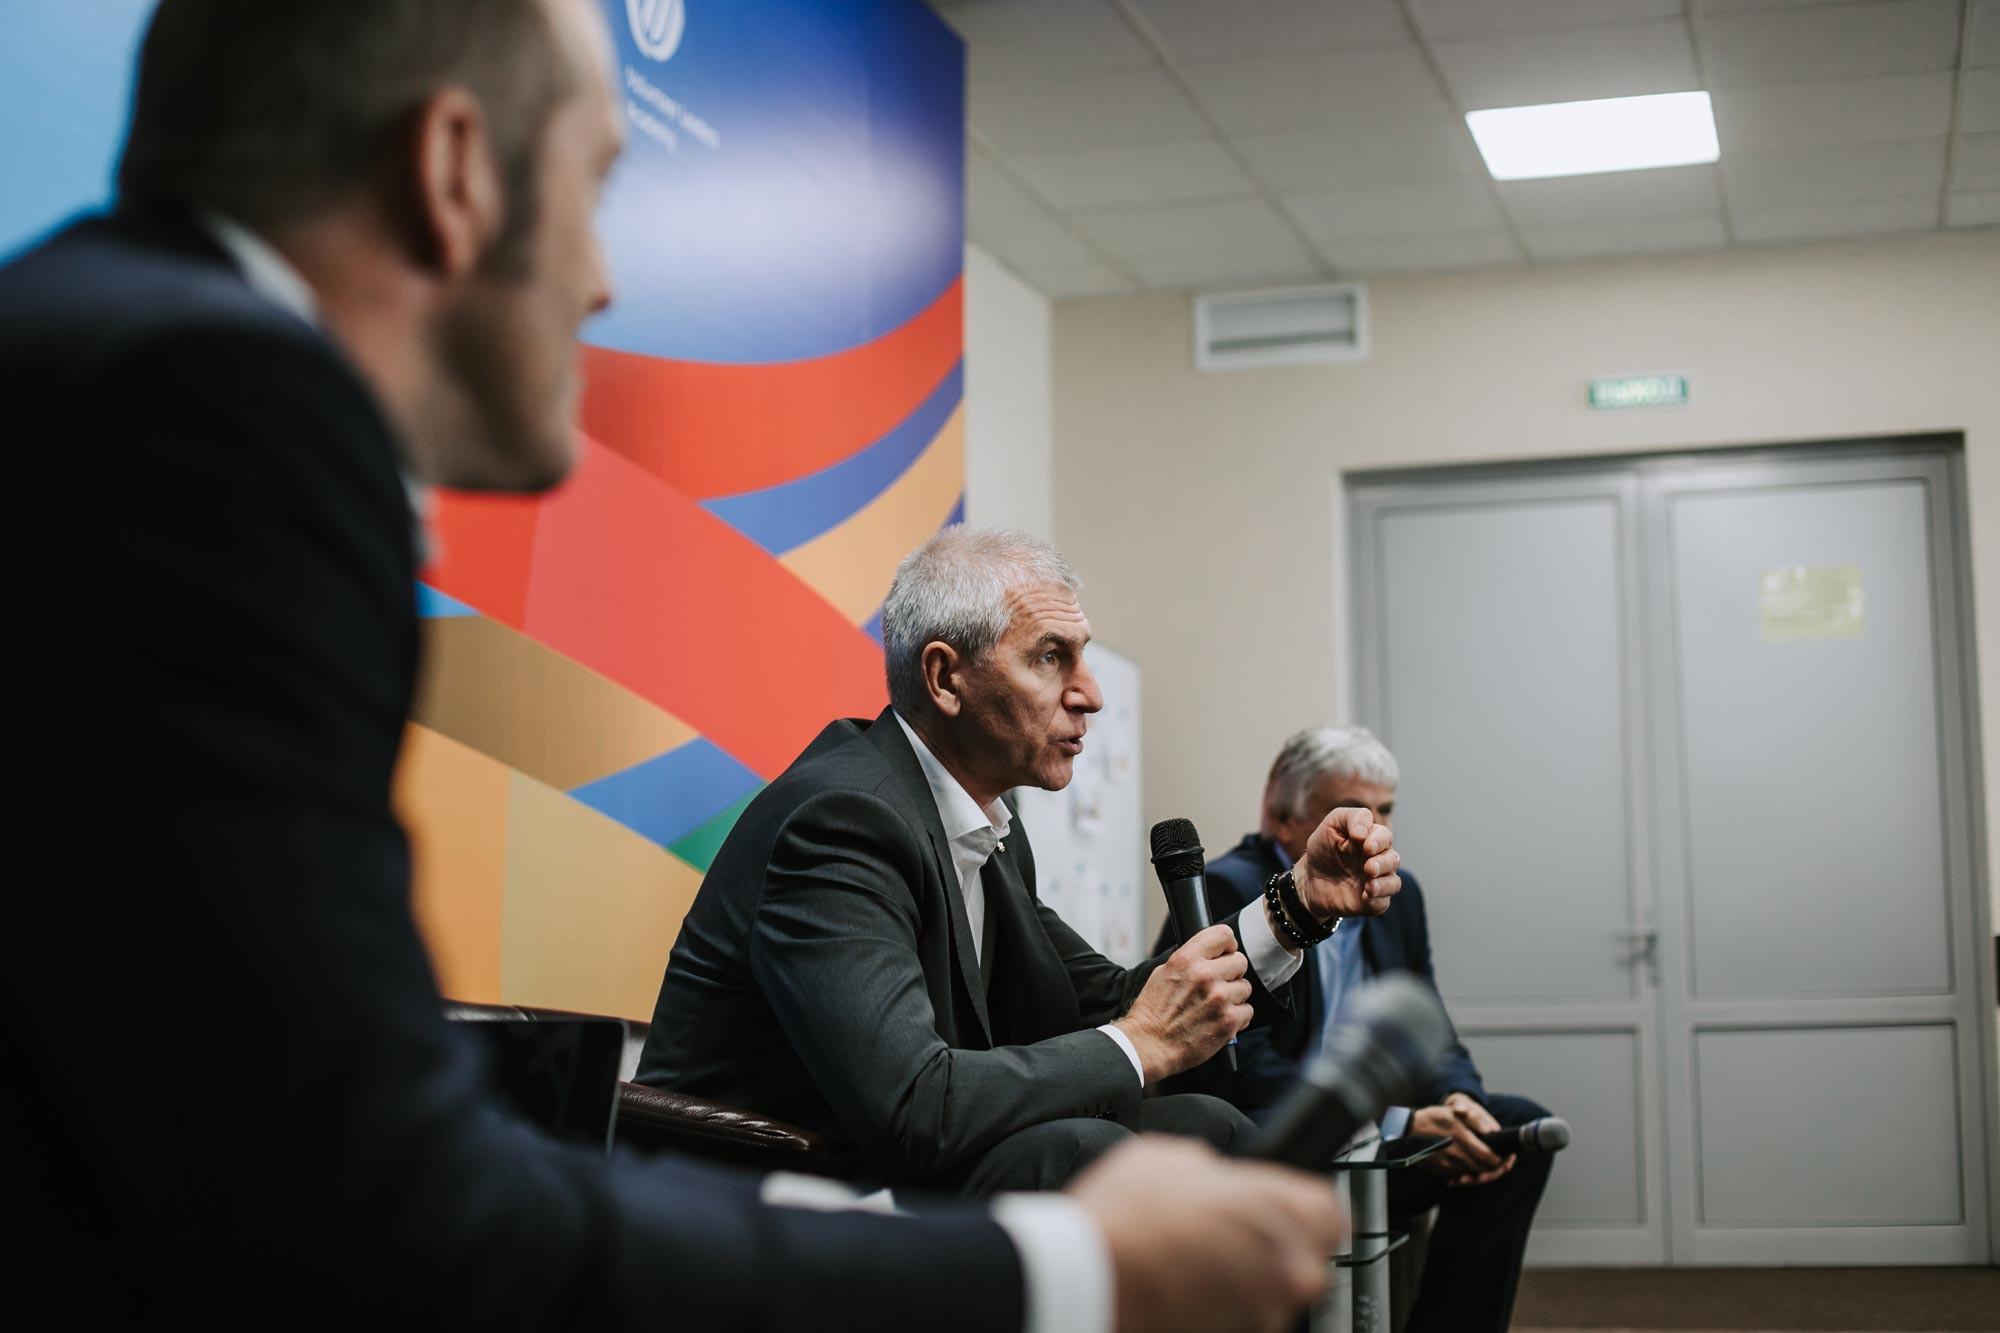 FISU President Oleg Matytsin was present at the Steering Committee meeting in Kazan ©FISU